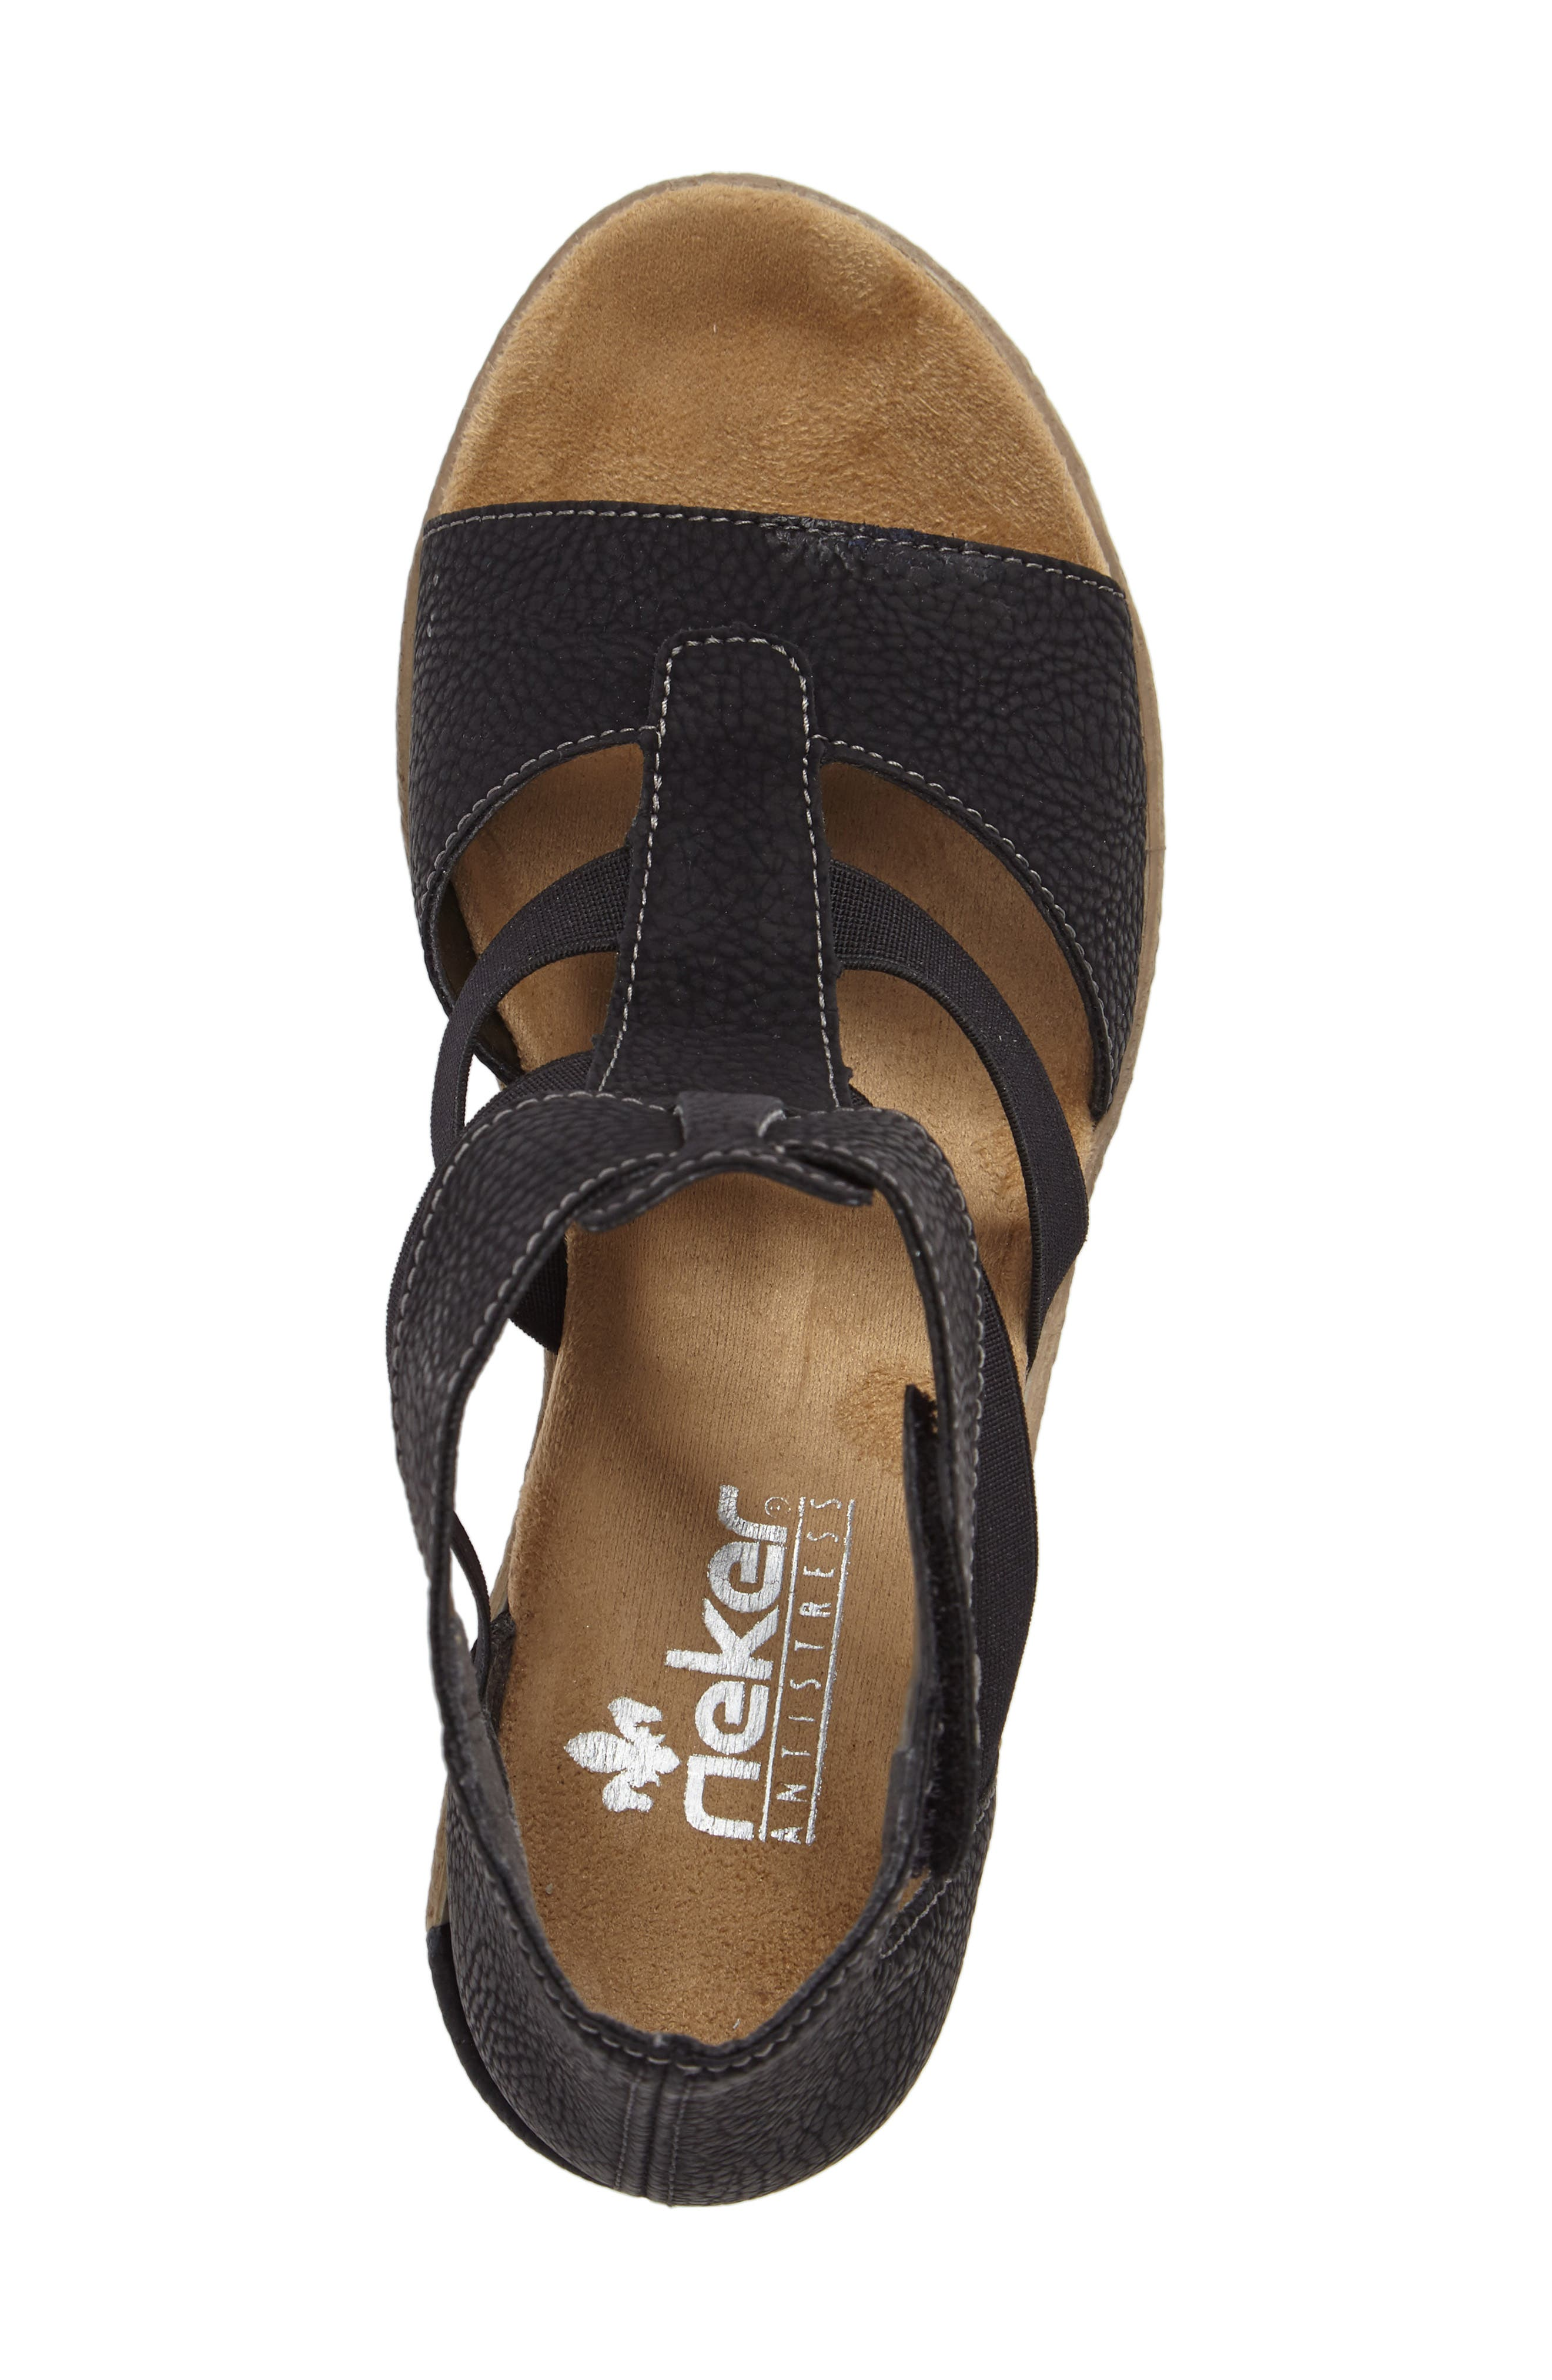 RIEKER ANTISTRESS,                             Fanni 39 Wedge Sandal,                             Alternate thumbnail 5, color,                             001